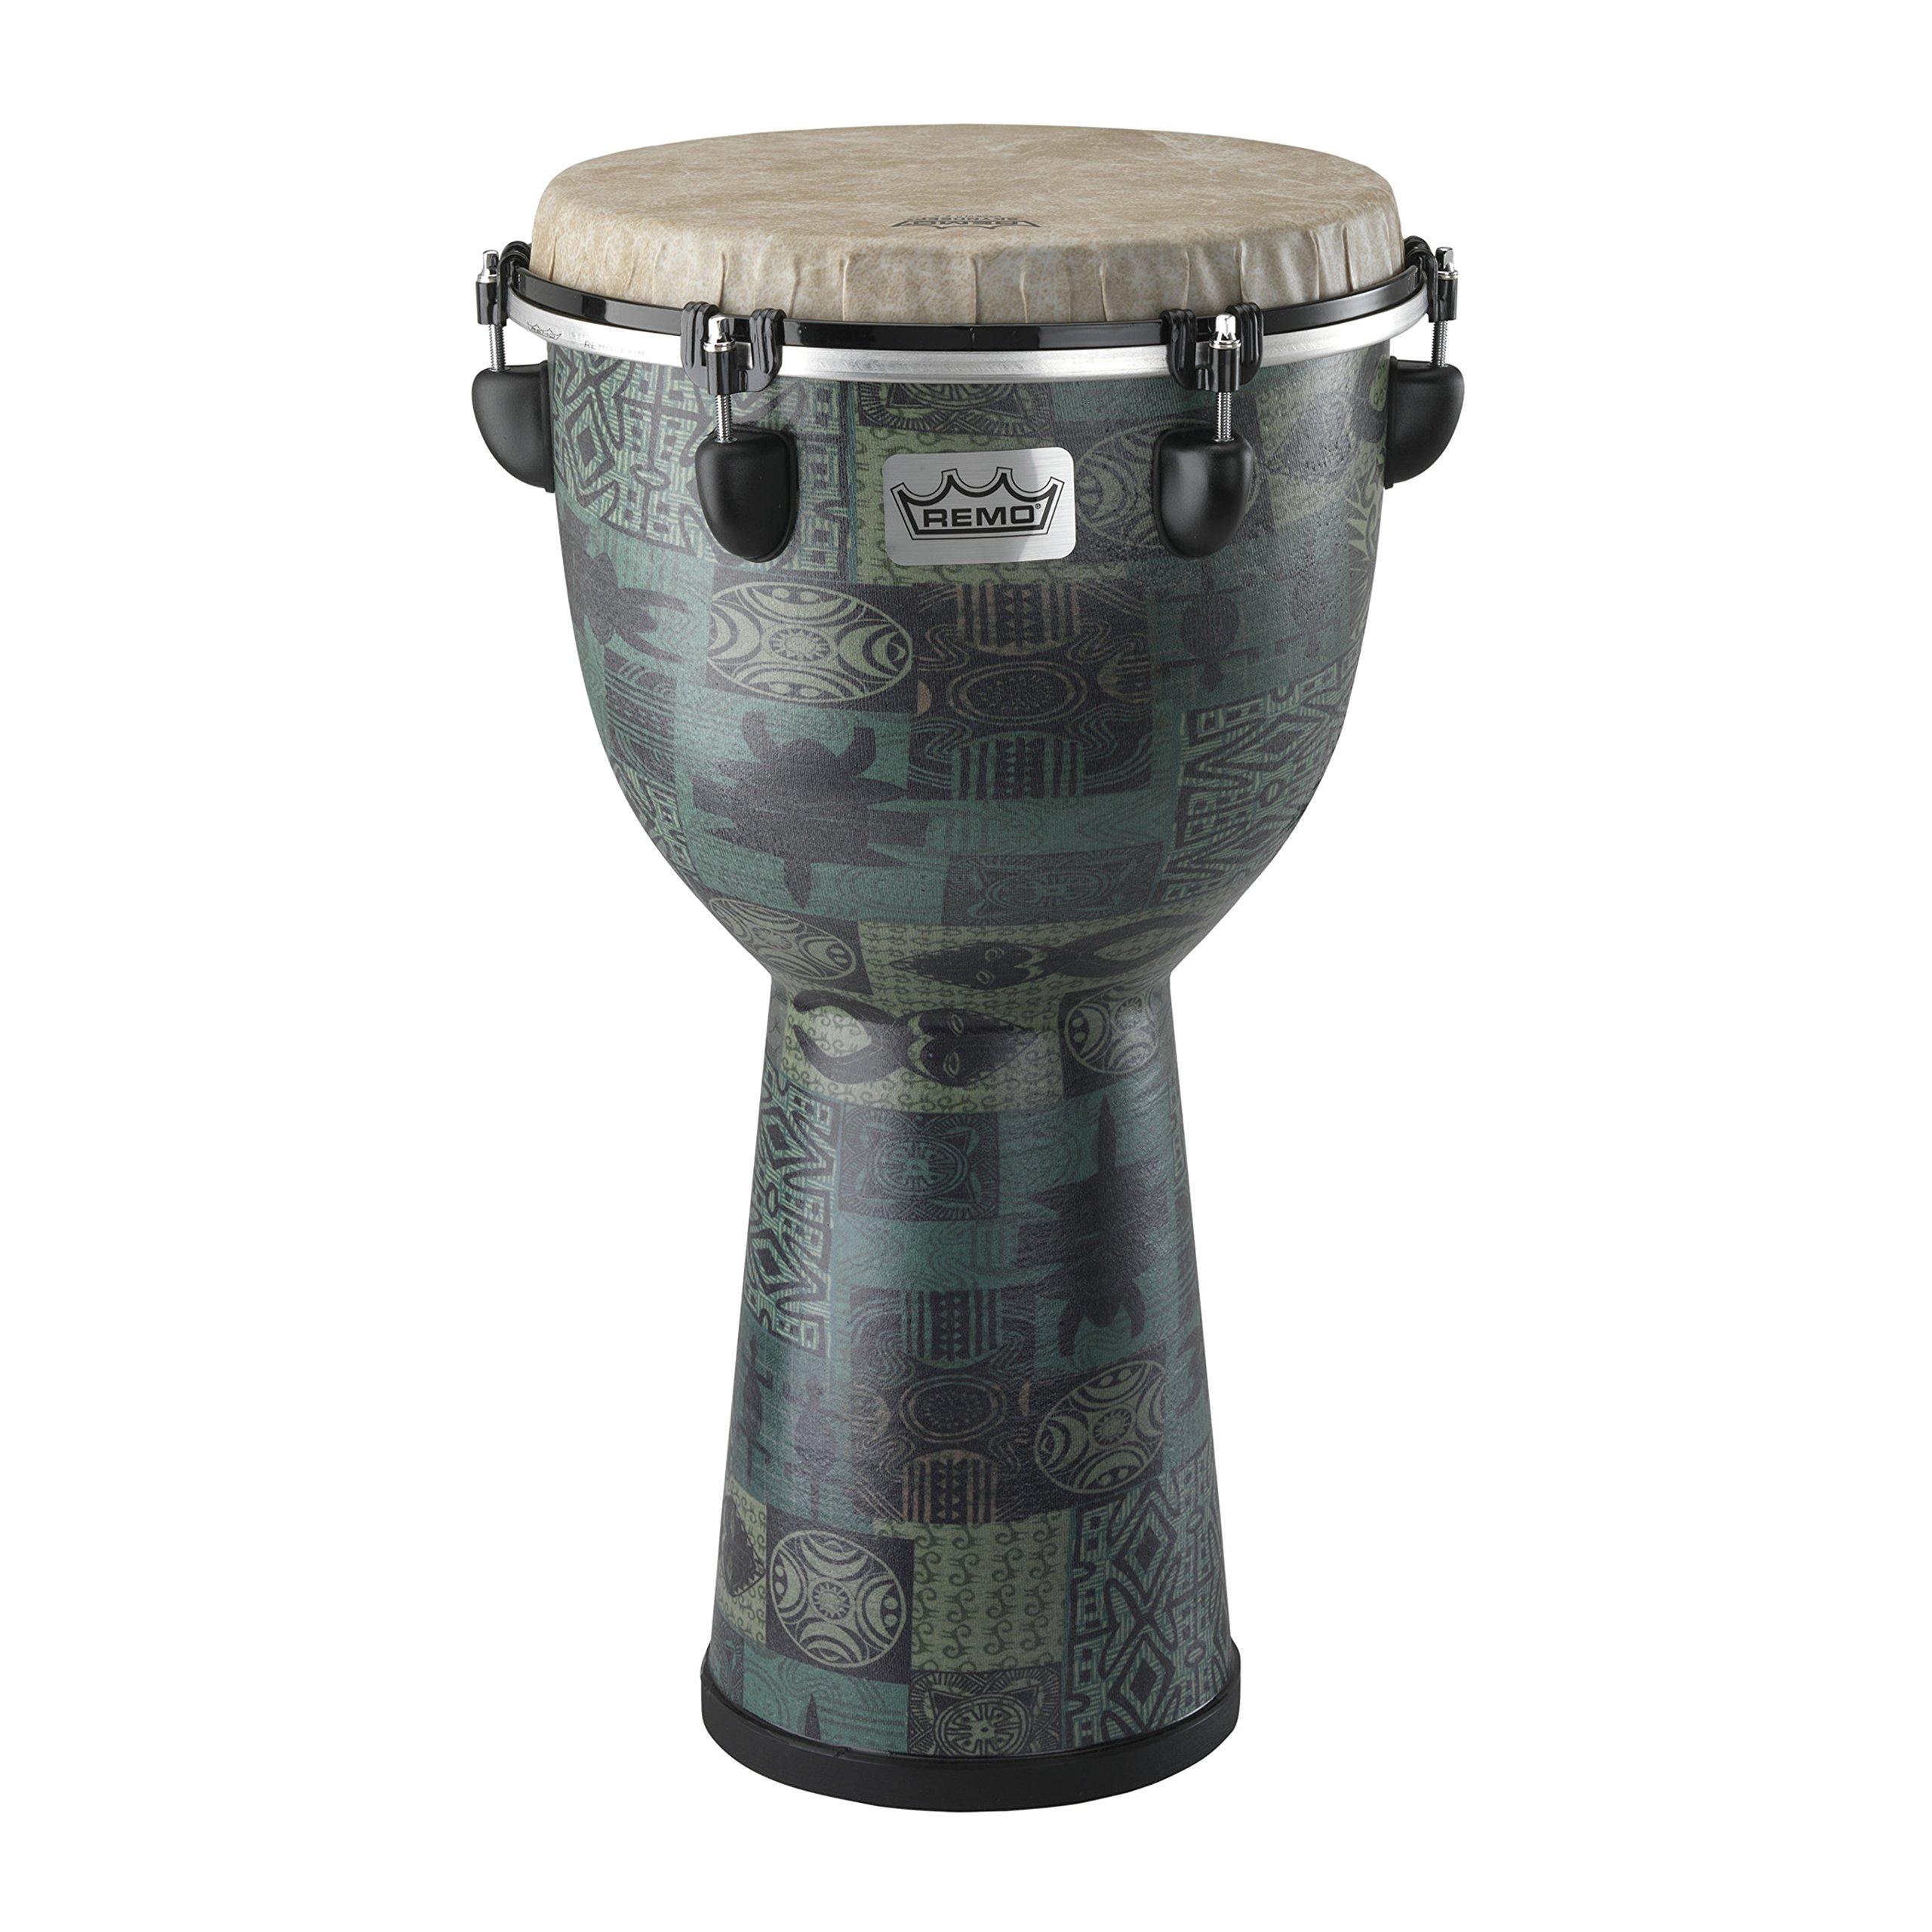 Remo DJ-6112-32 Apex Djembe Drum - Green Kinte, 12''